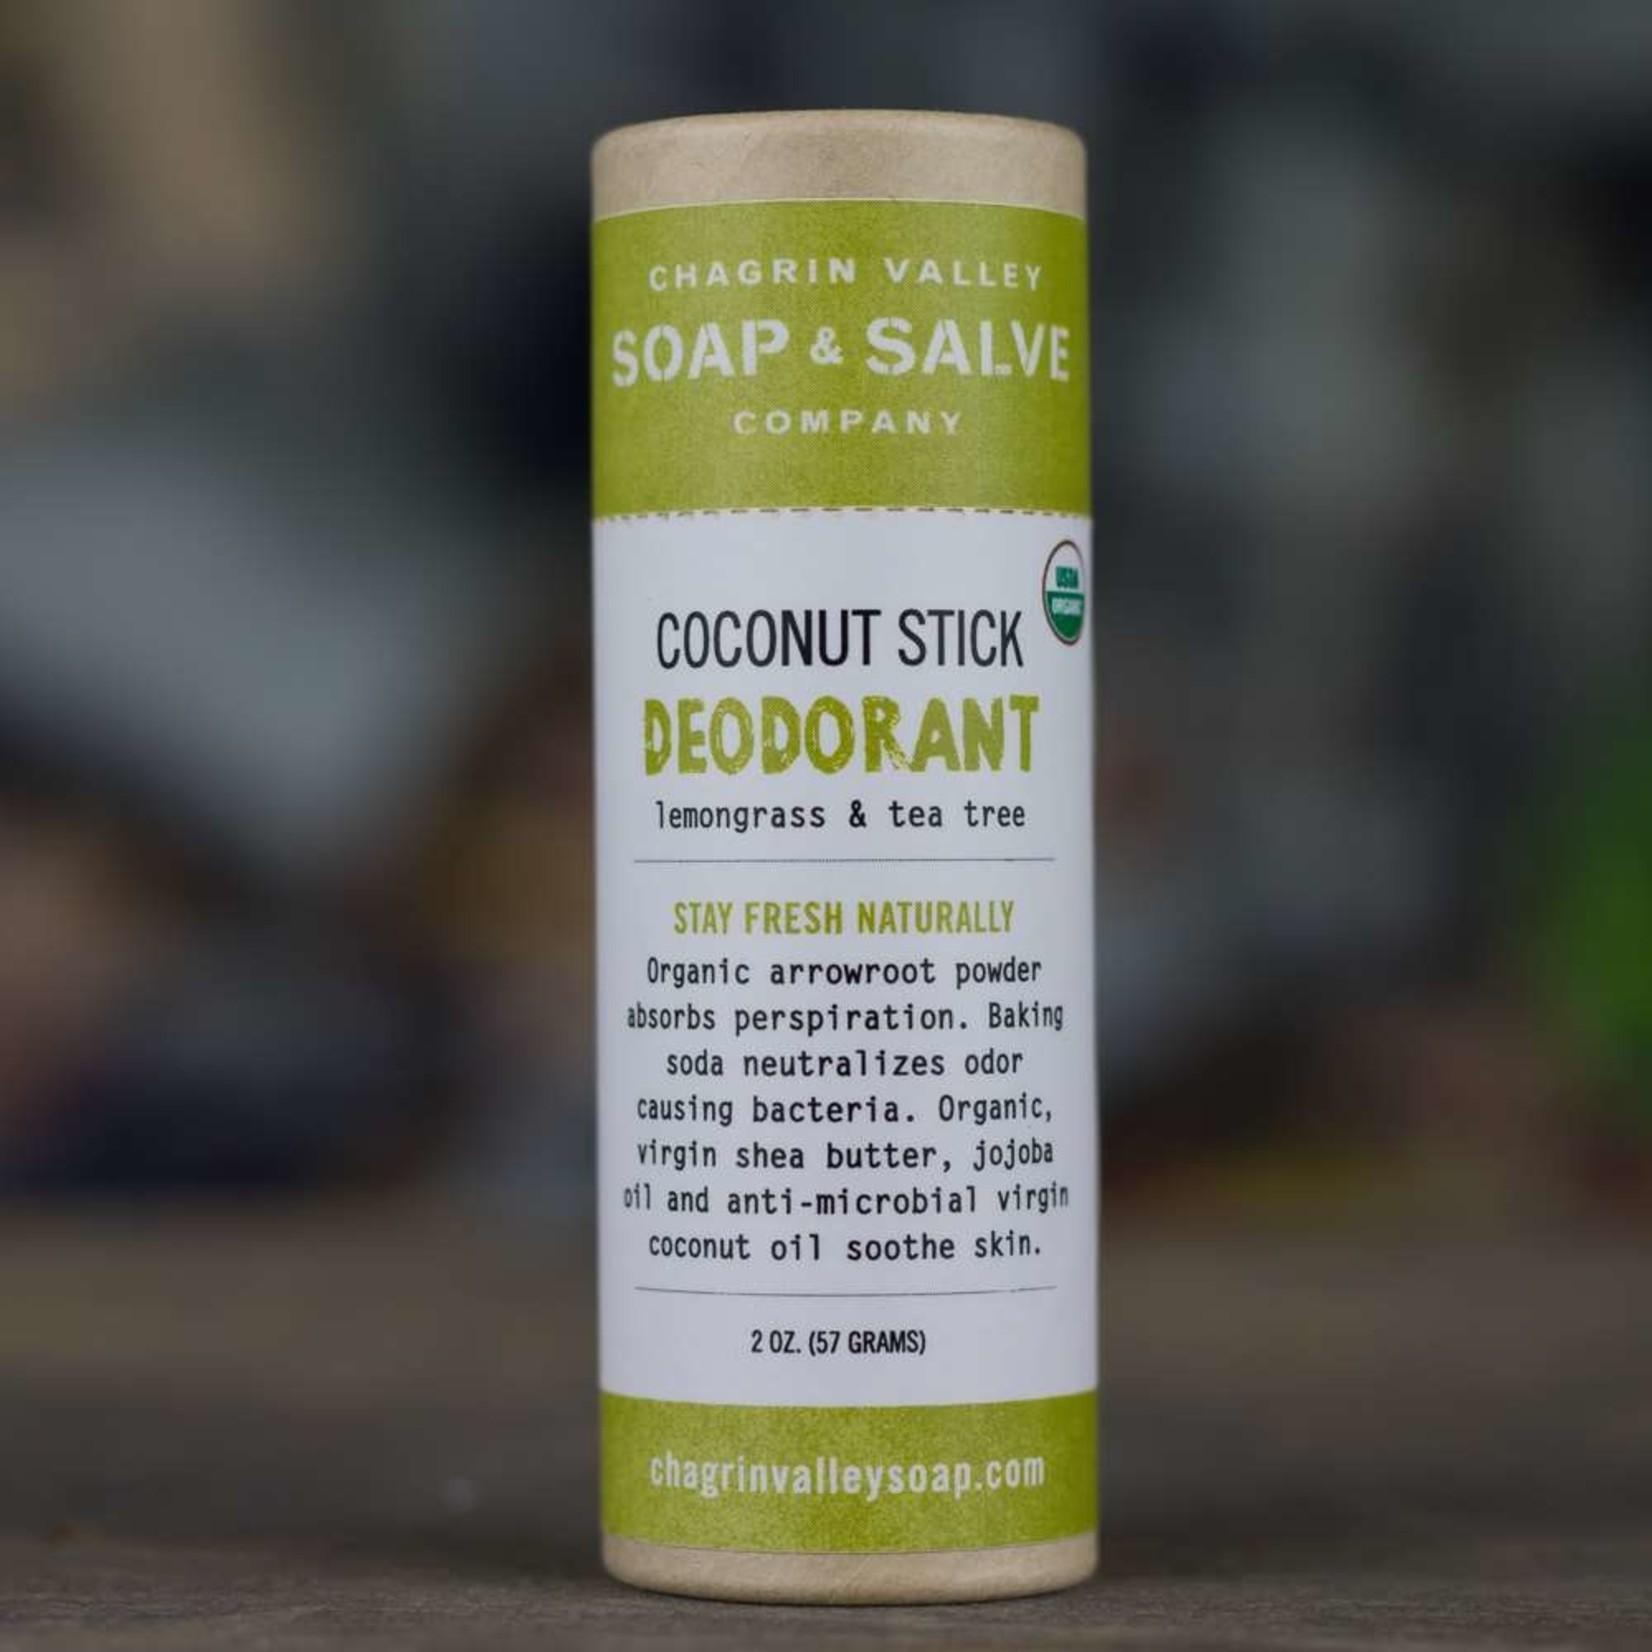 Chagrin Valley Soap and Salve Lemon Grass &Tea Tree Scent 1.5oz Coconut Stick Deodorant